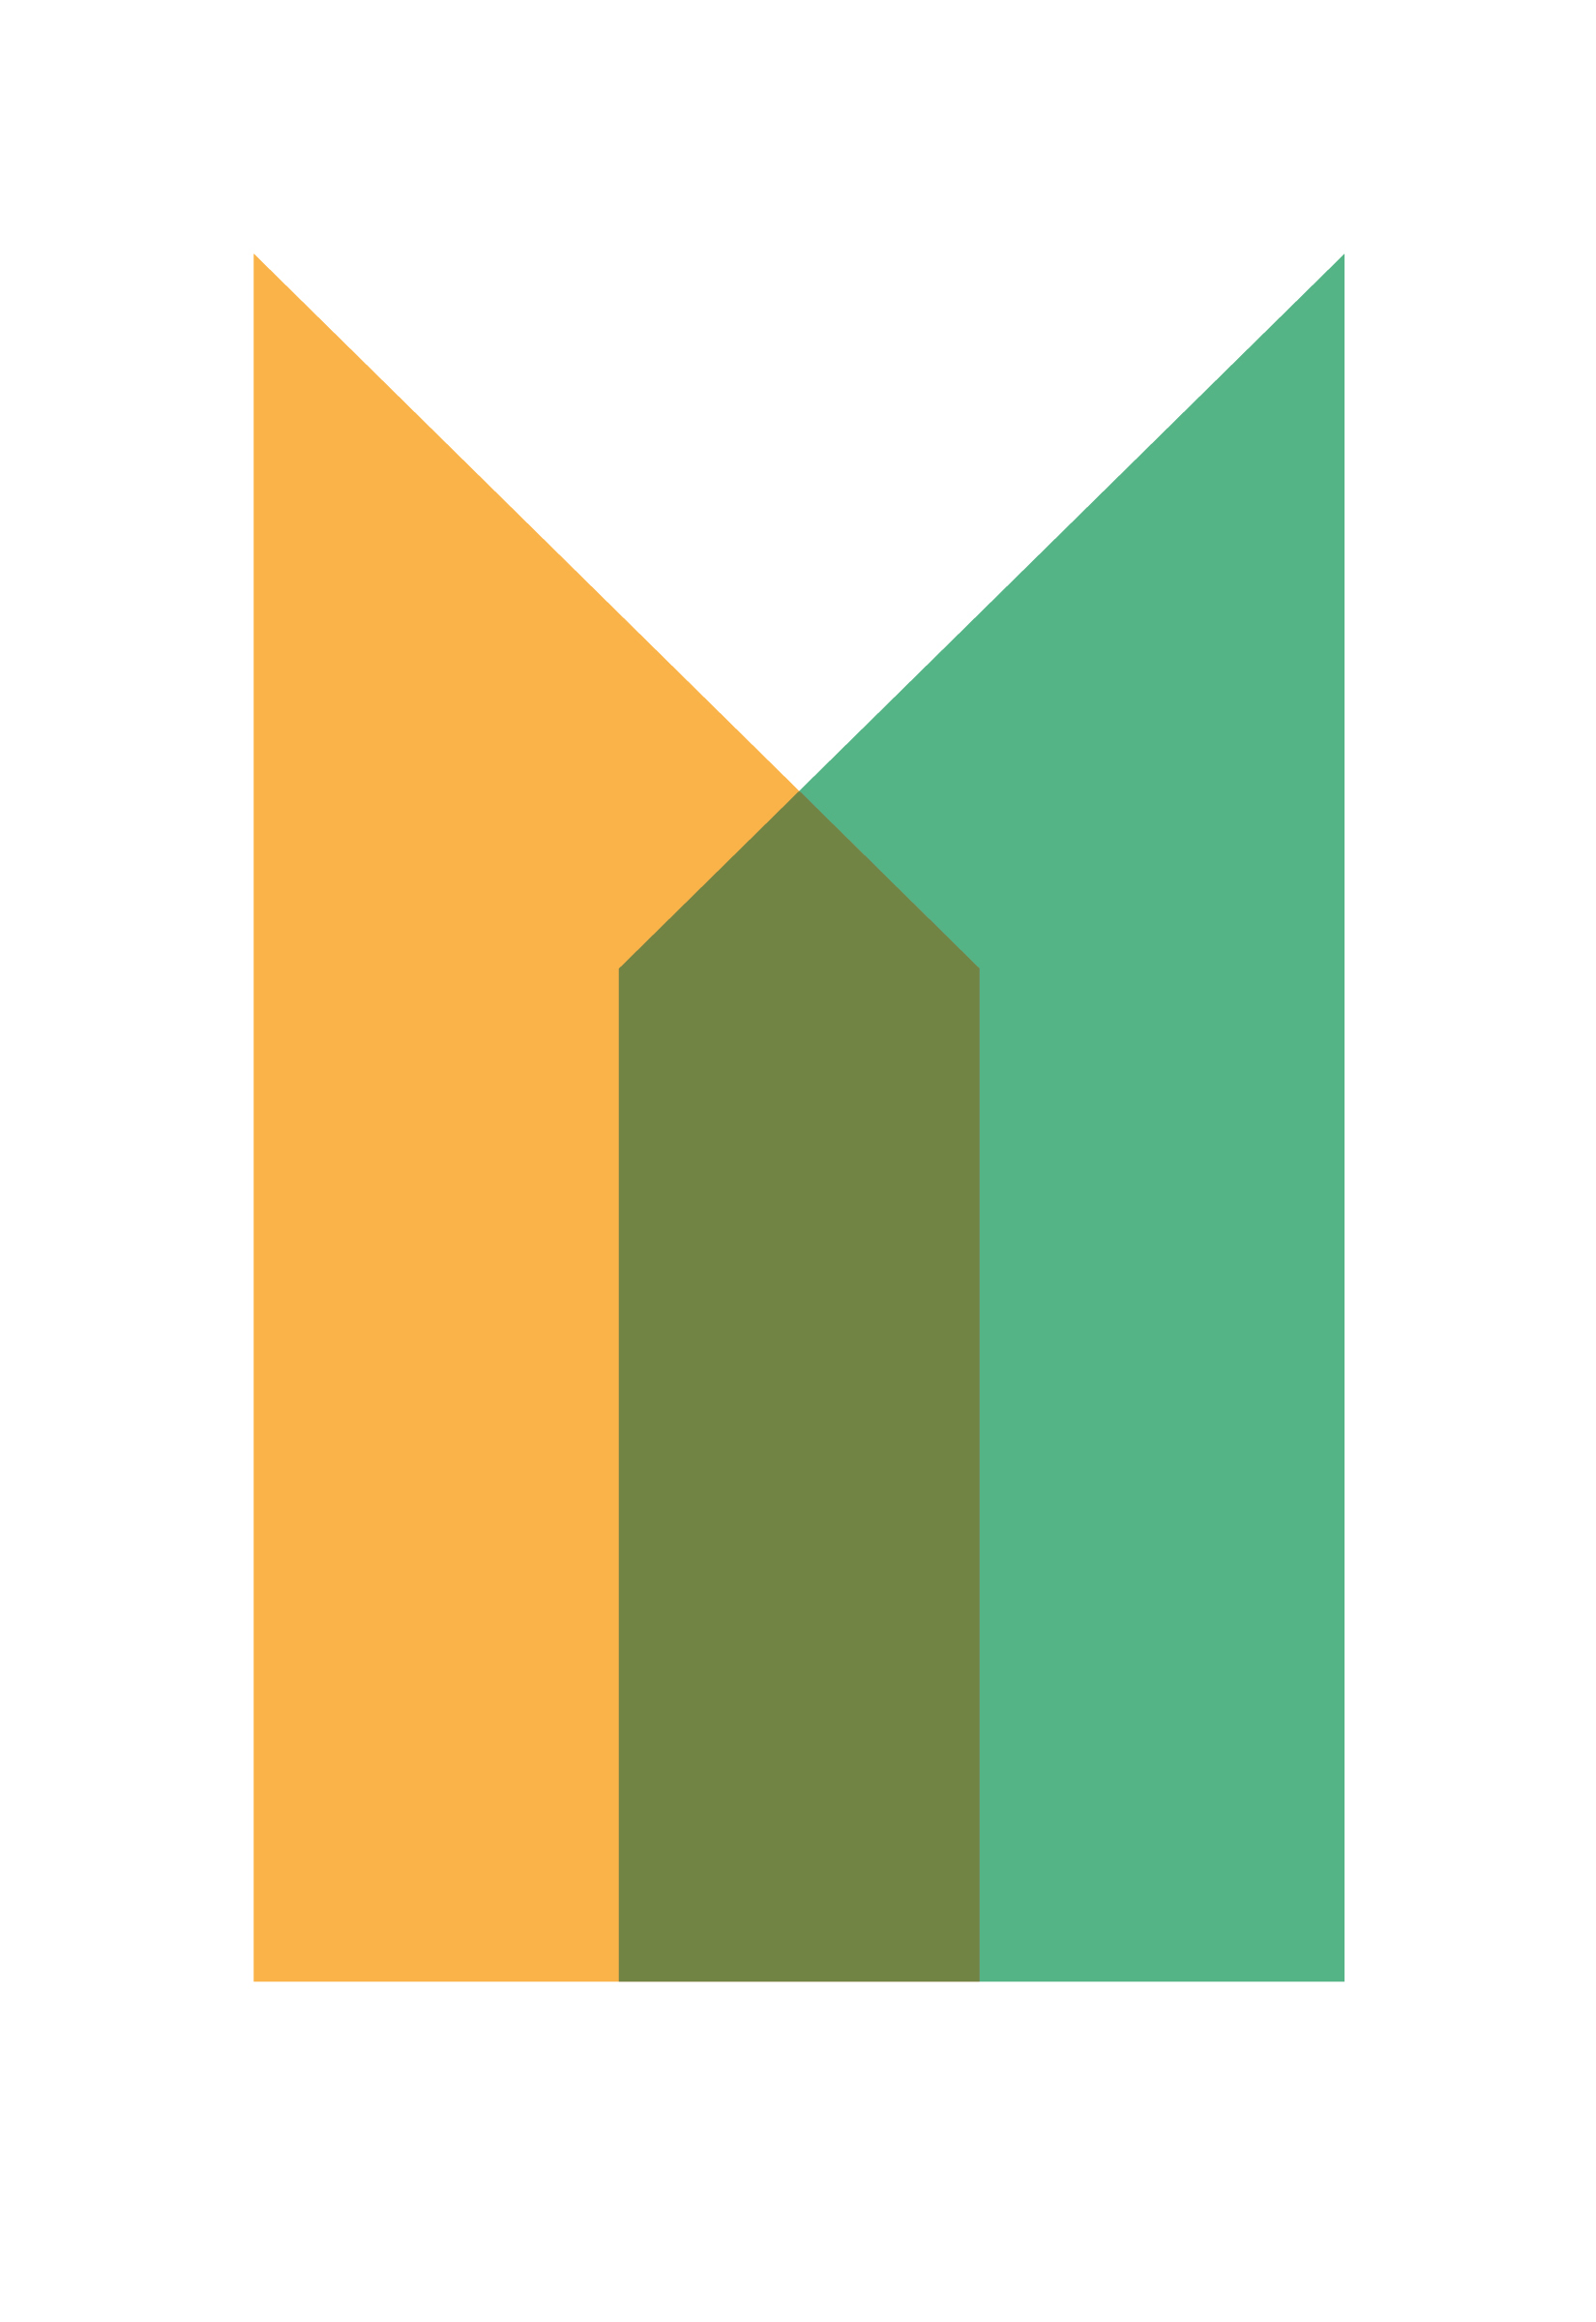 knitcon_alpha13.jpg